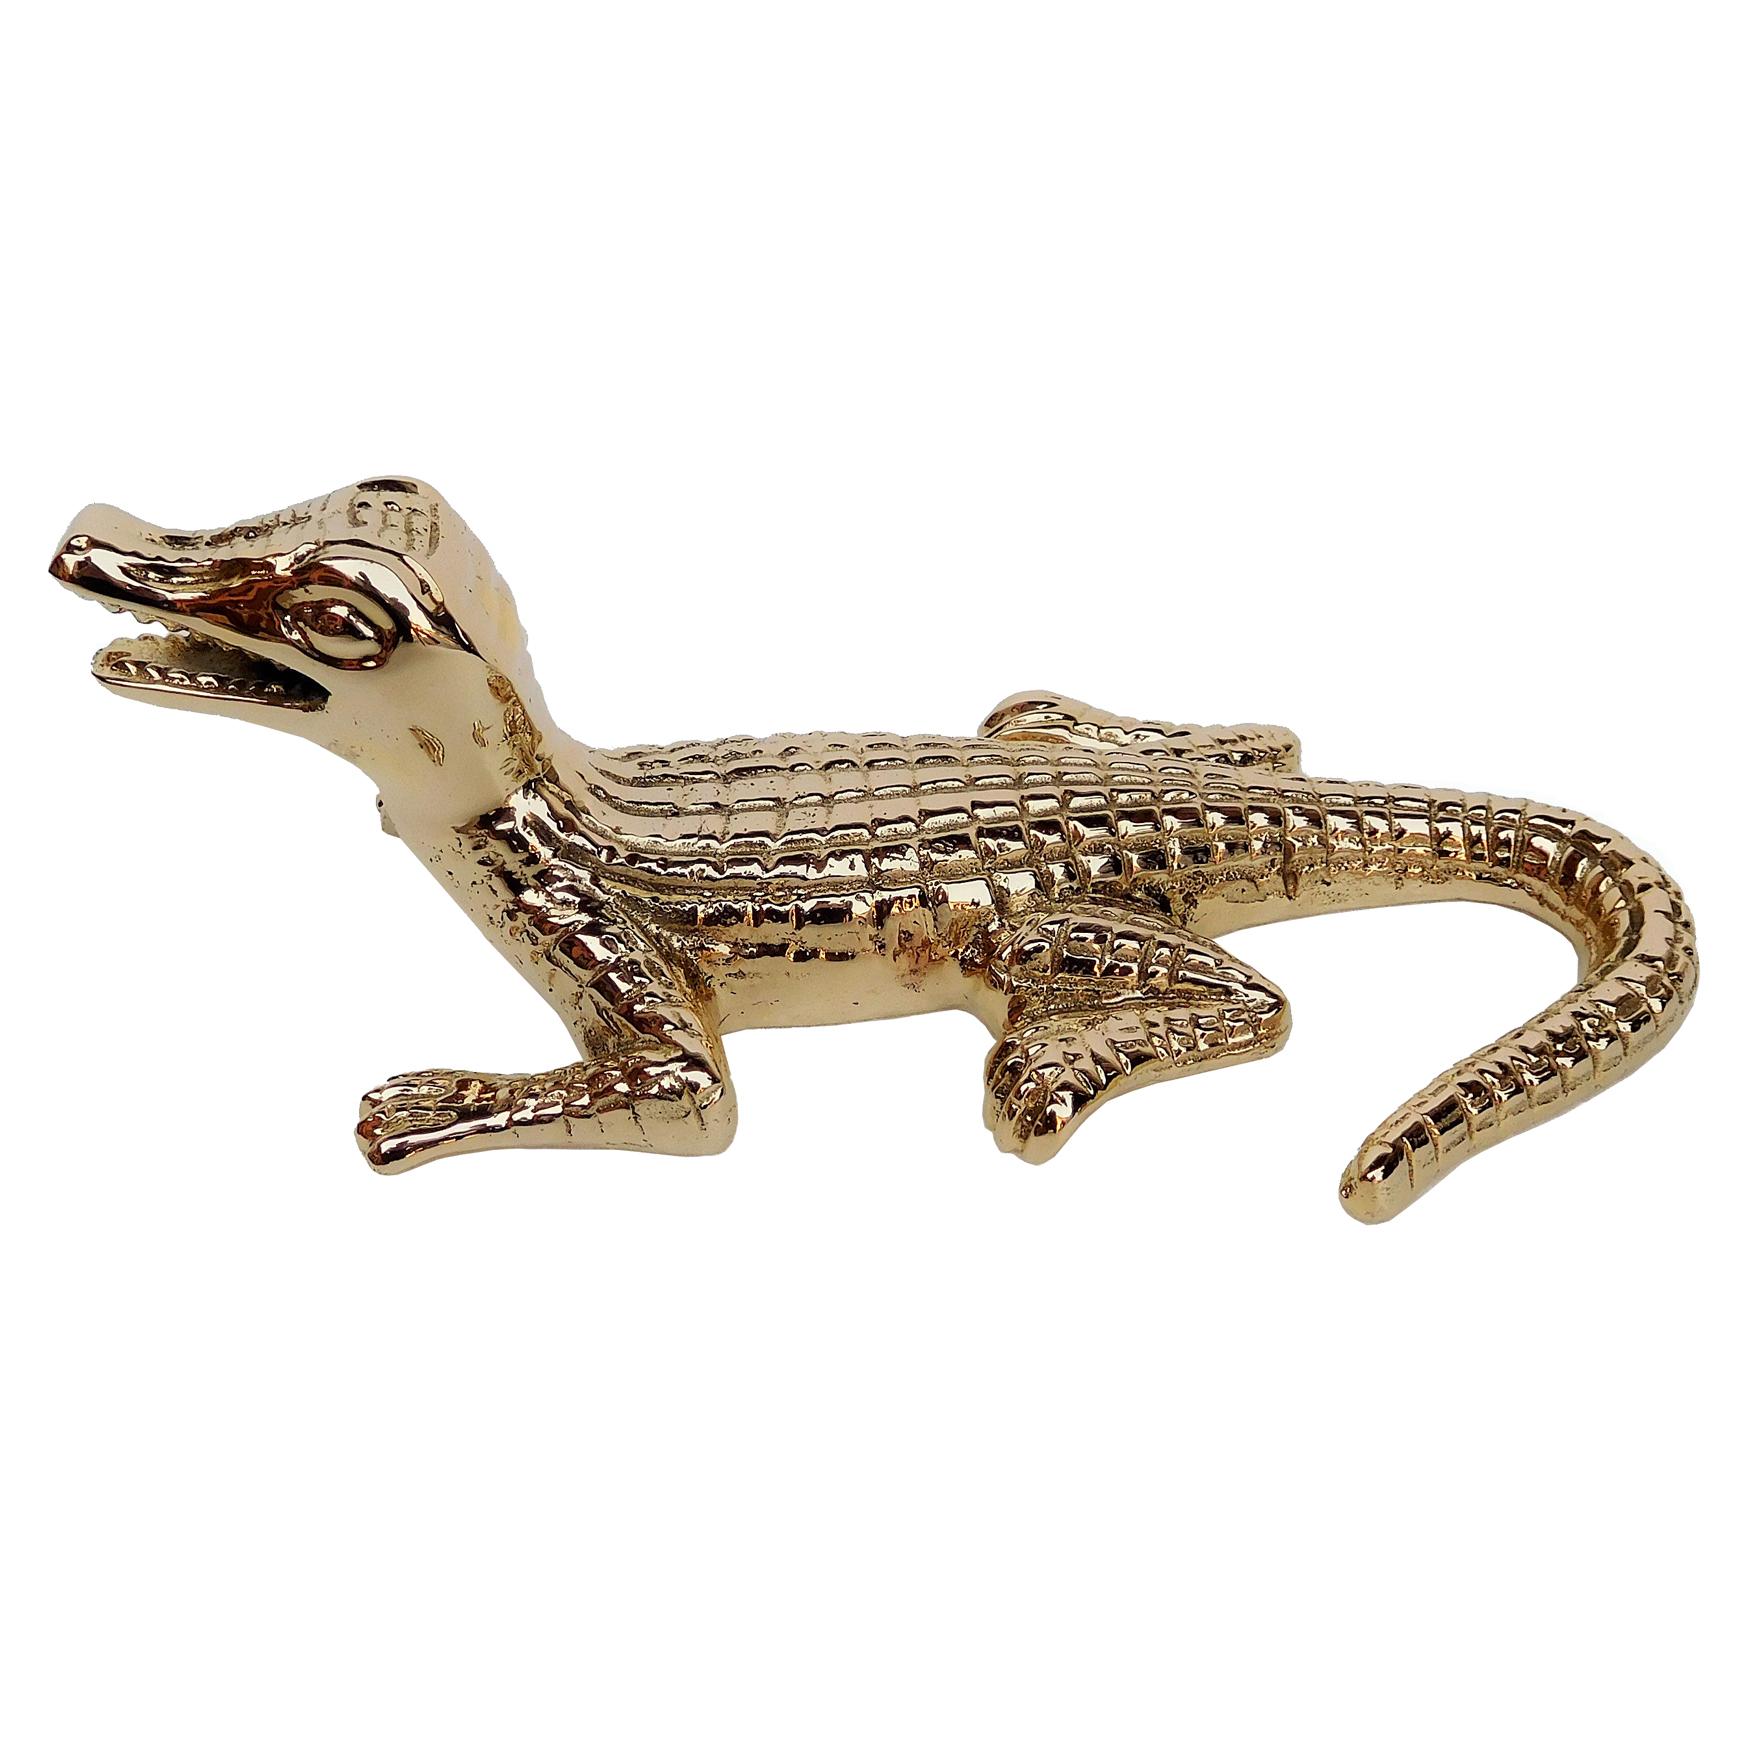 Hollywood Regency Plated Gold Baby Alligator Sculpture